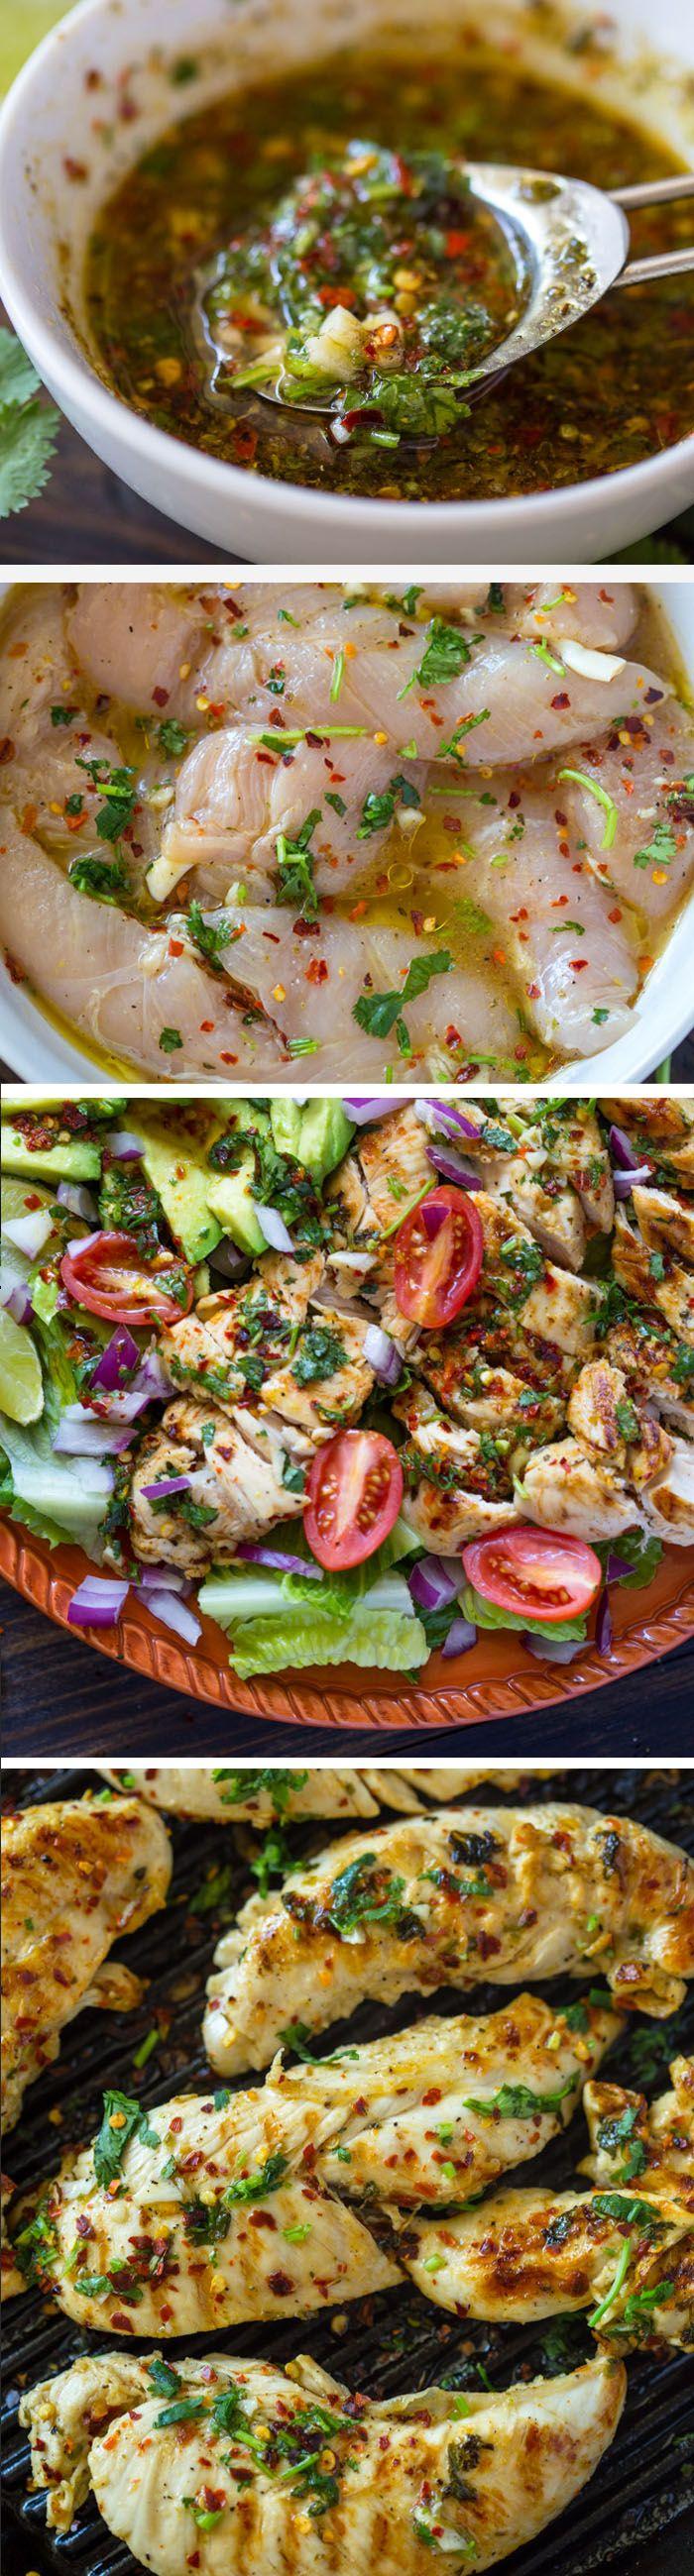 Grilled Chili Cilantro Lime Chicken | https://lomejordelaweb.es/